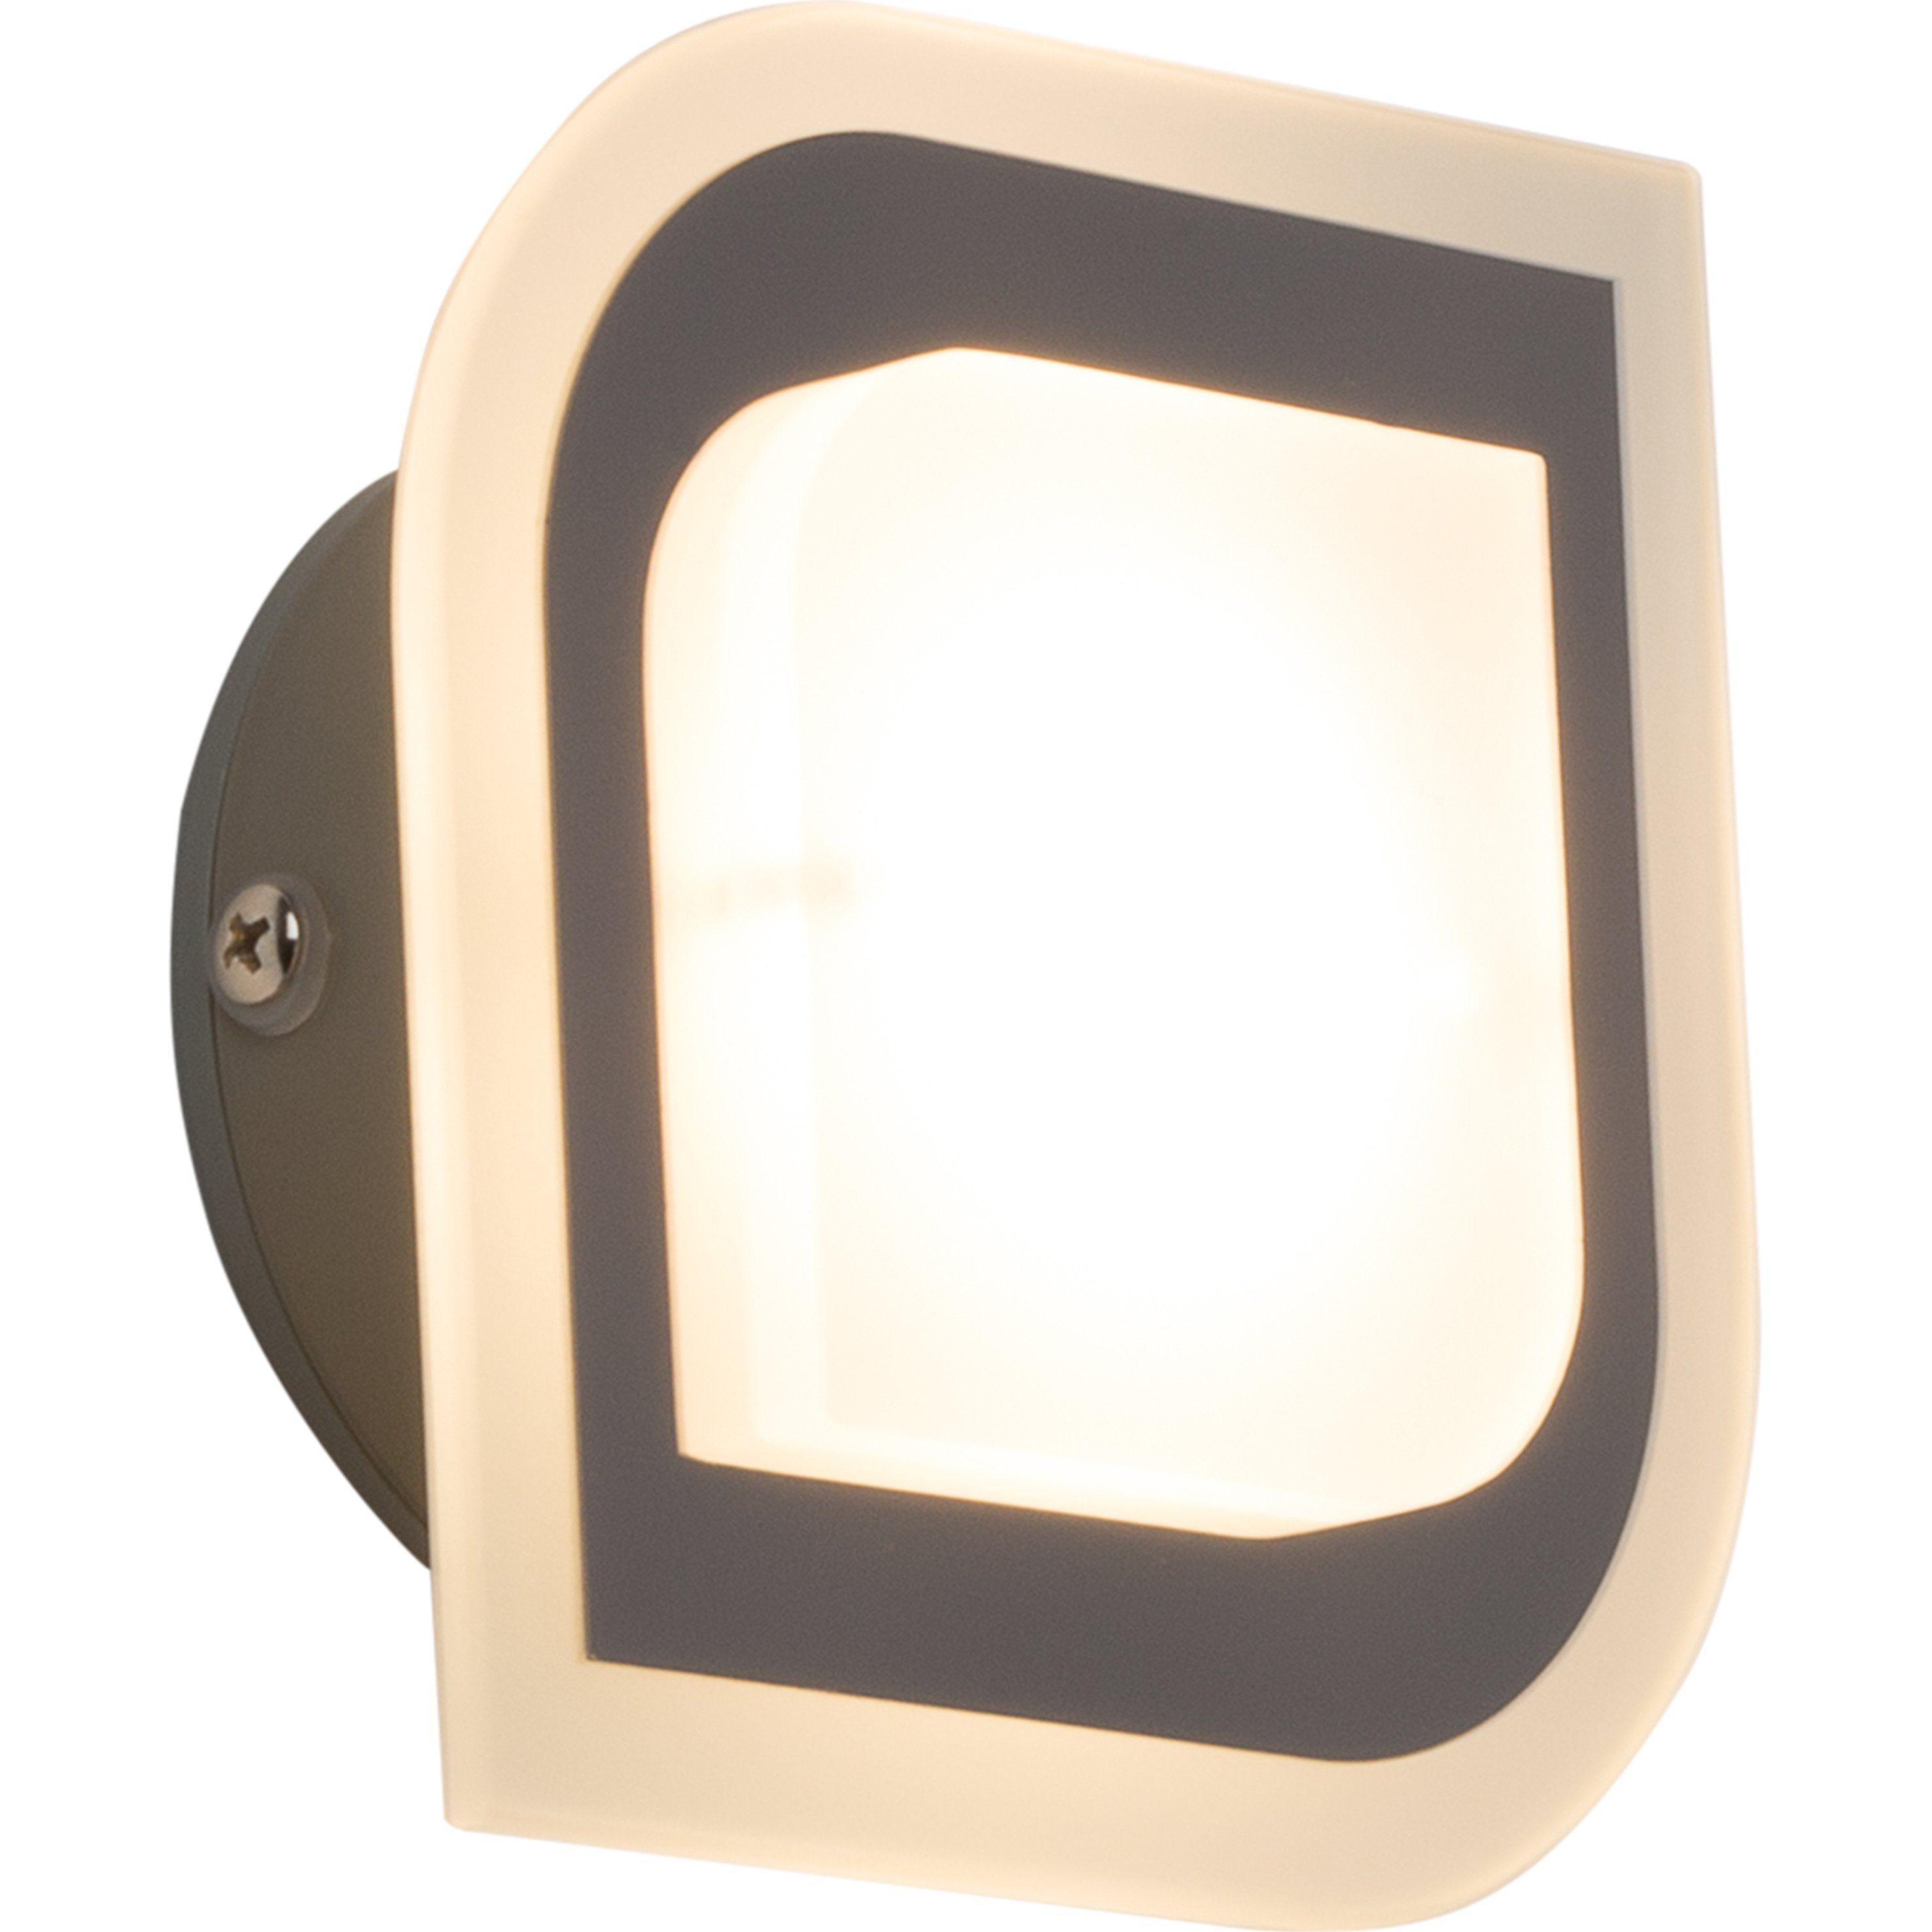 Brilliant Leuchten Formular LED Wandleuchte, 1-flammig chrom IP44